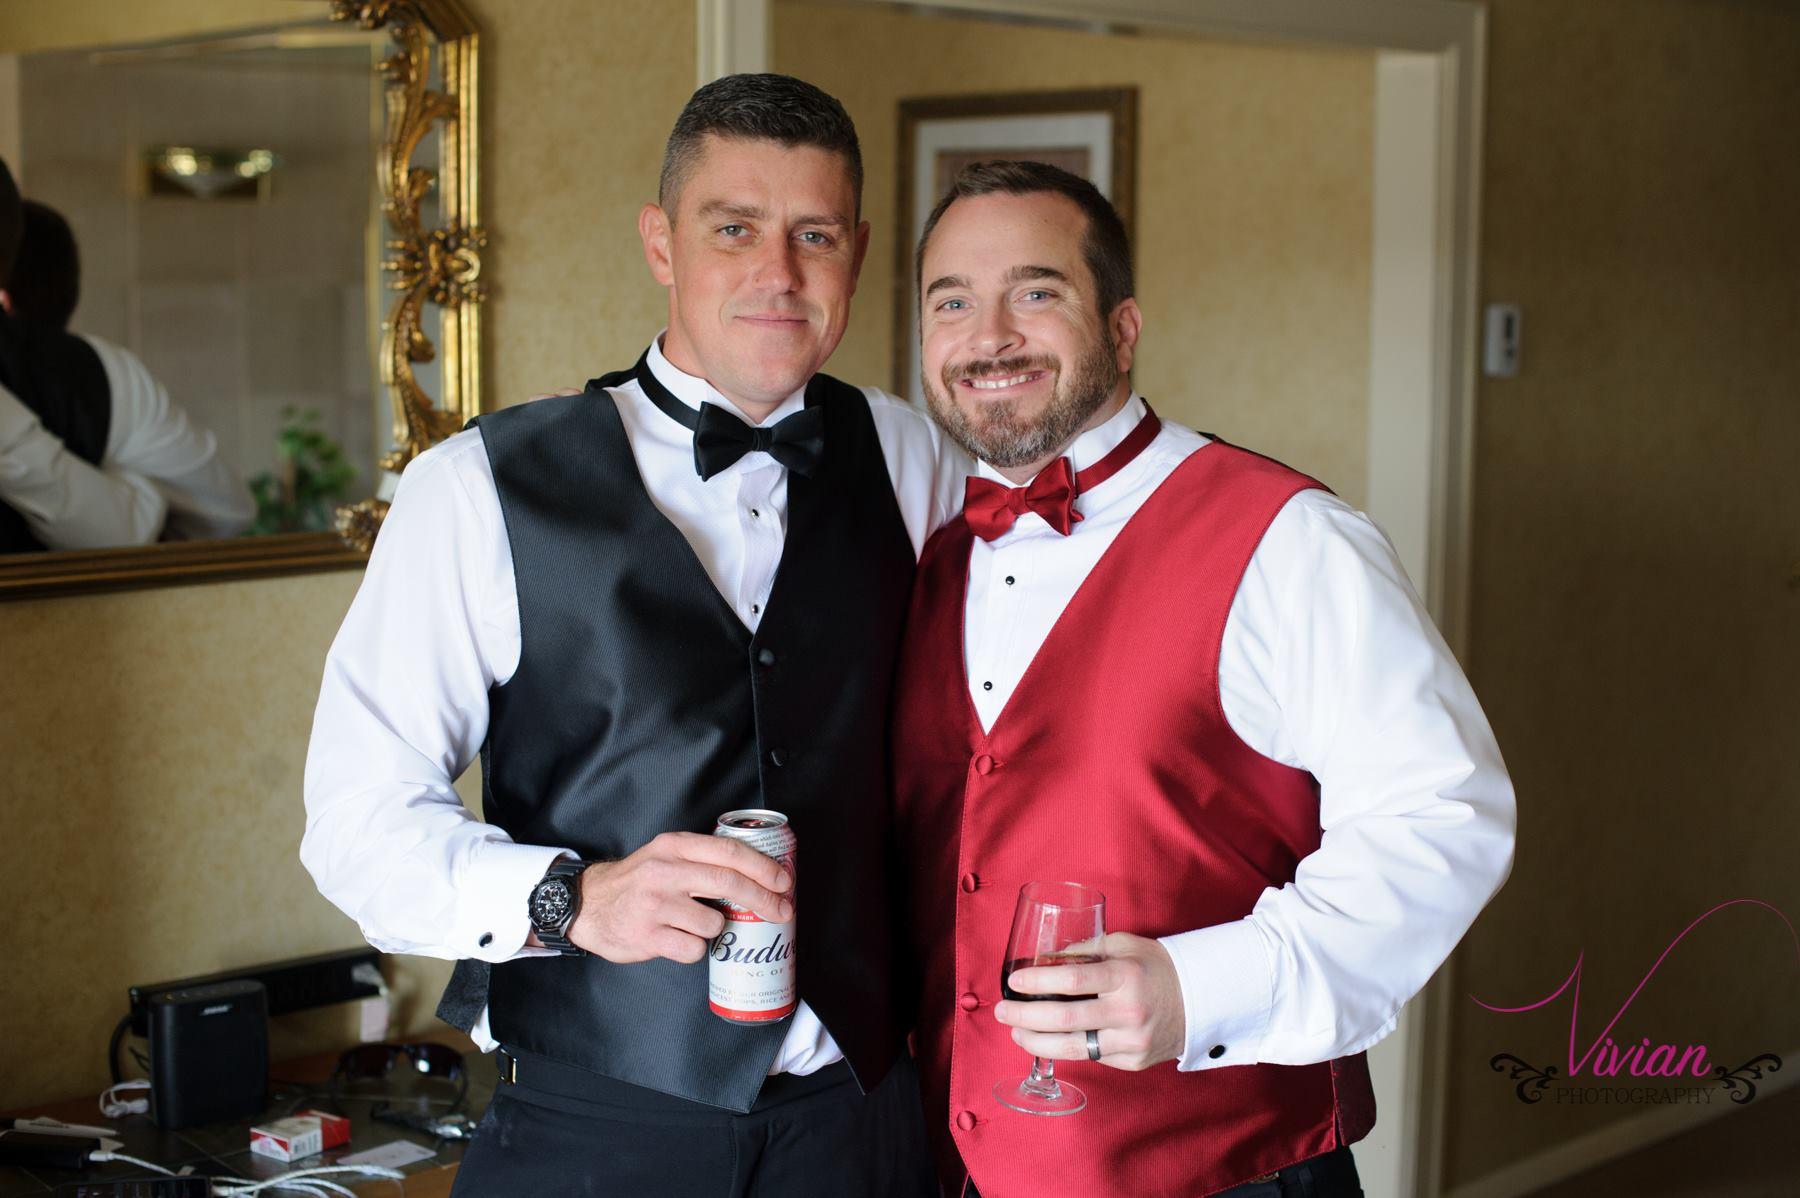 groom-and-bestman-posing-with-beer-cans.jpg